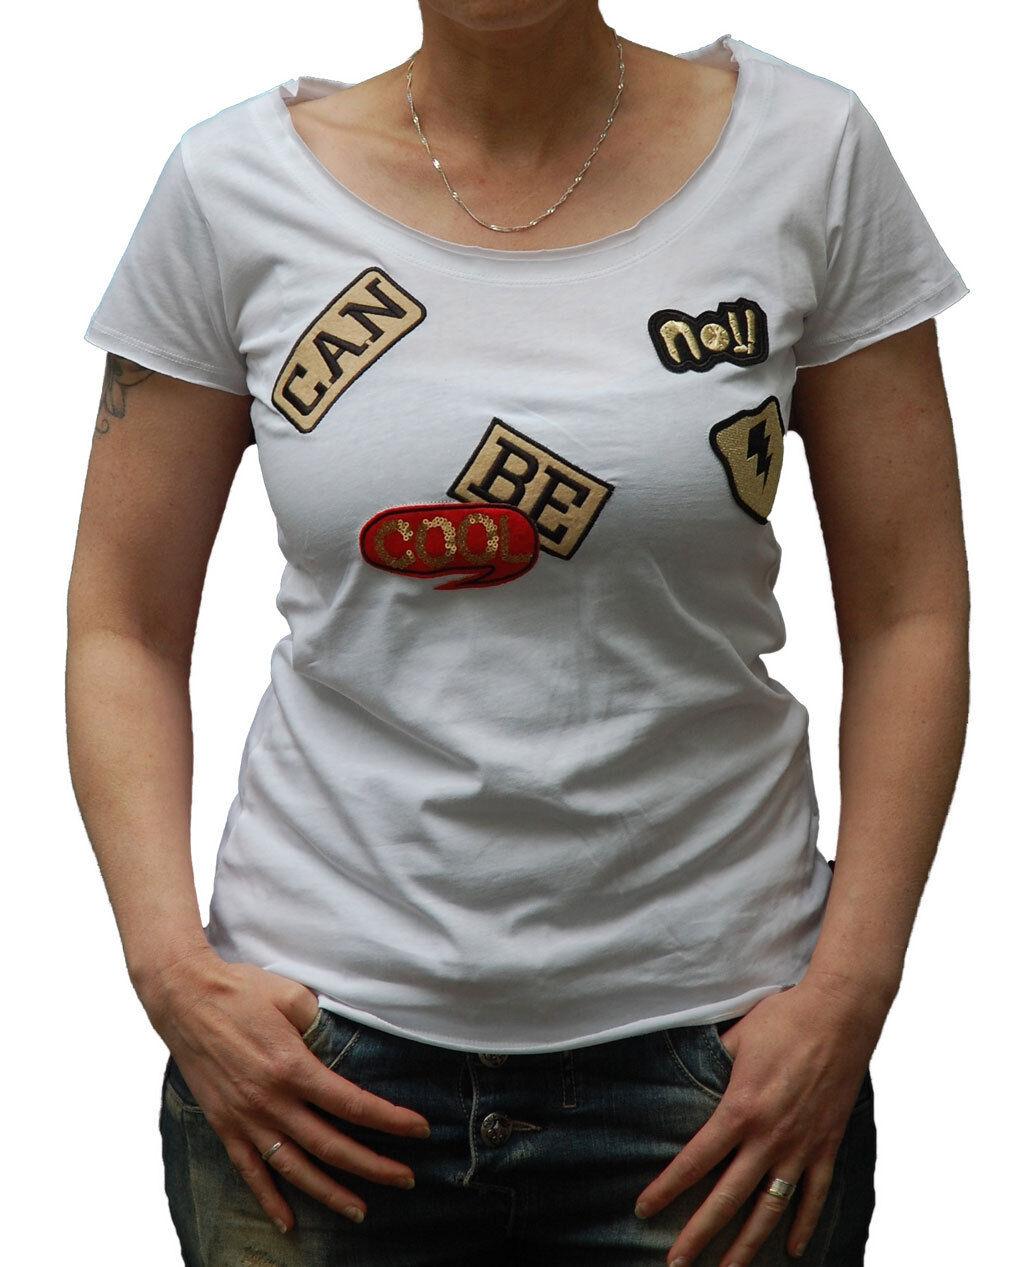 Key Largo, Damen-T-Shirt, No, Patches, White